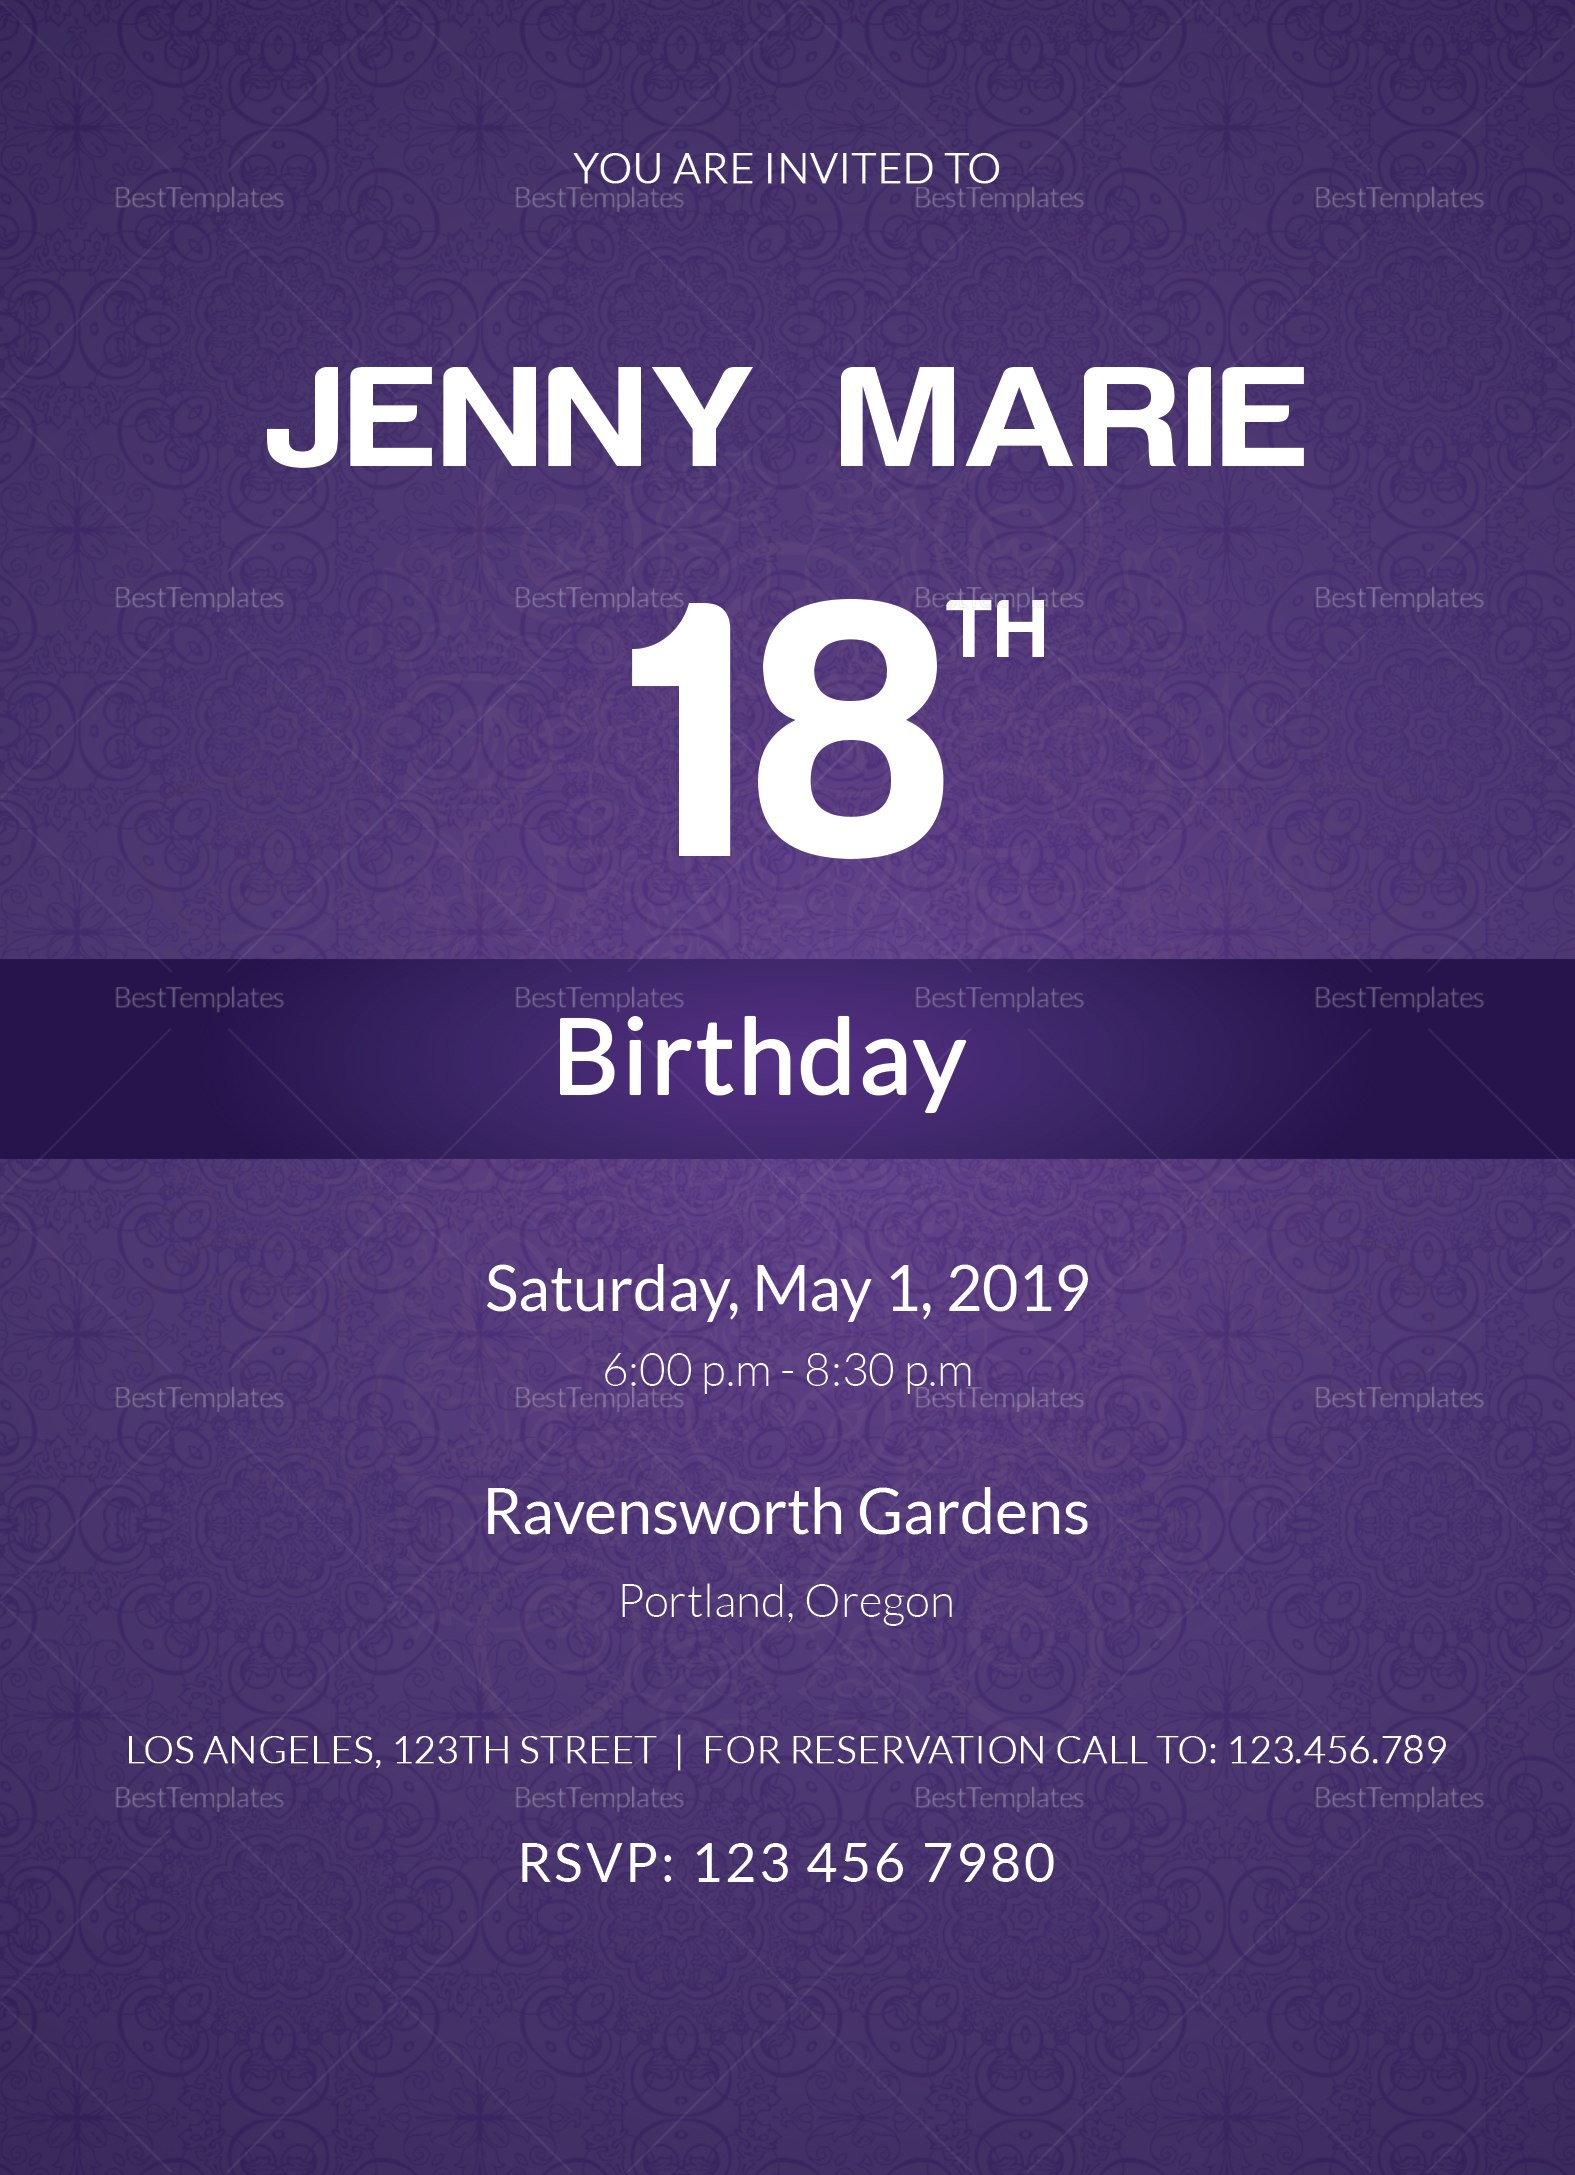 Debut Event Invitation Card Design Template In Word Psd Publisher In Event Invitation Card Template